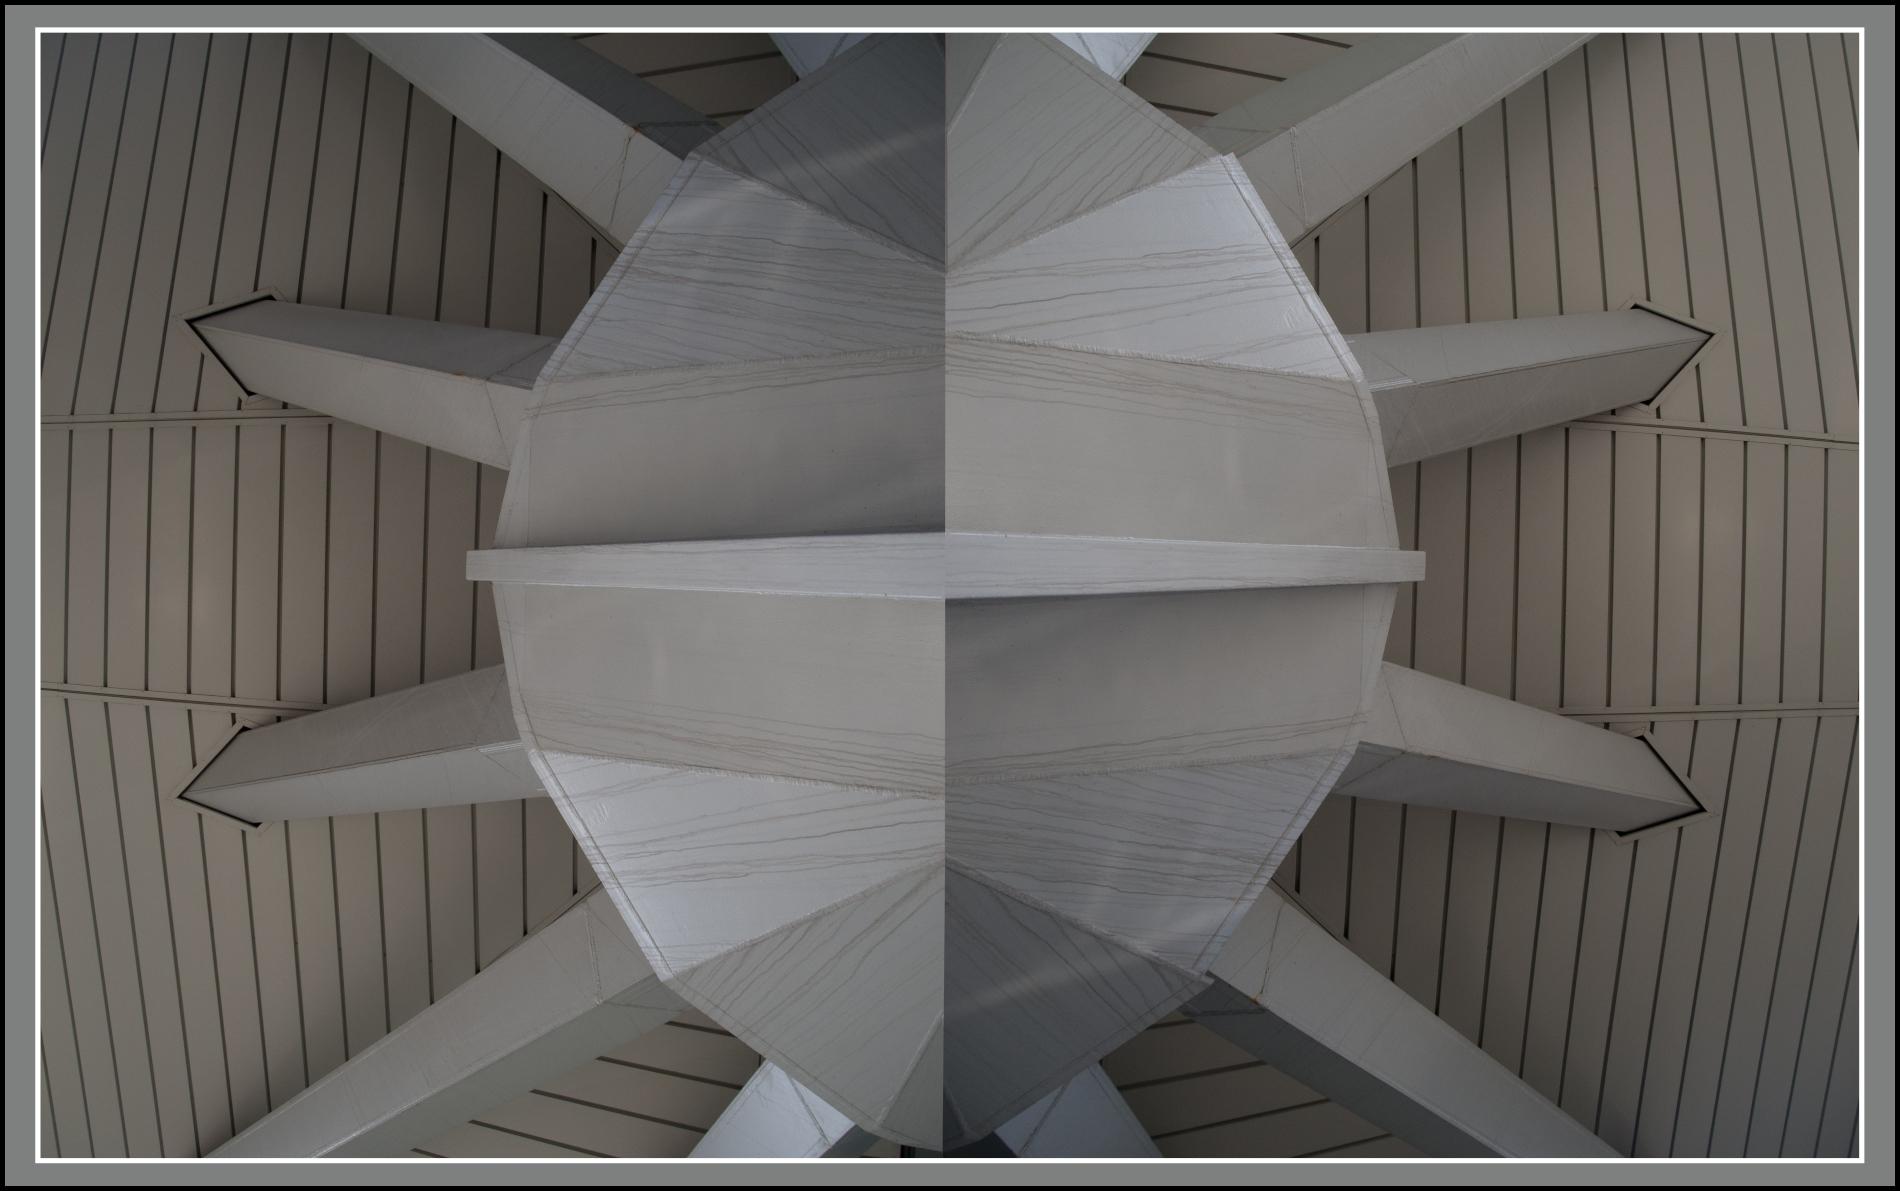 WEB_Achmea-aTree-2-fin